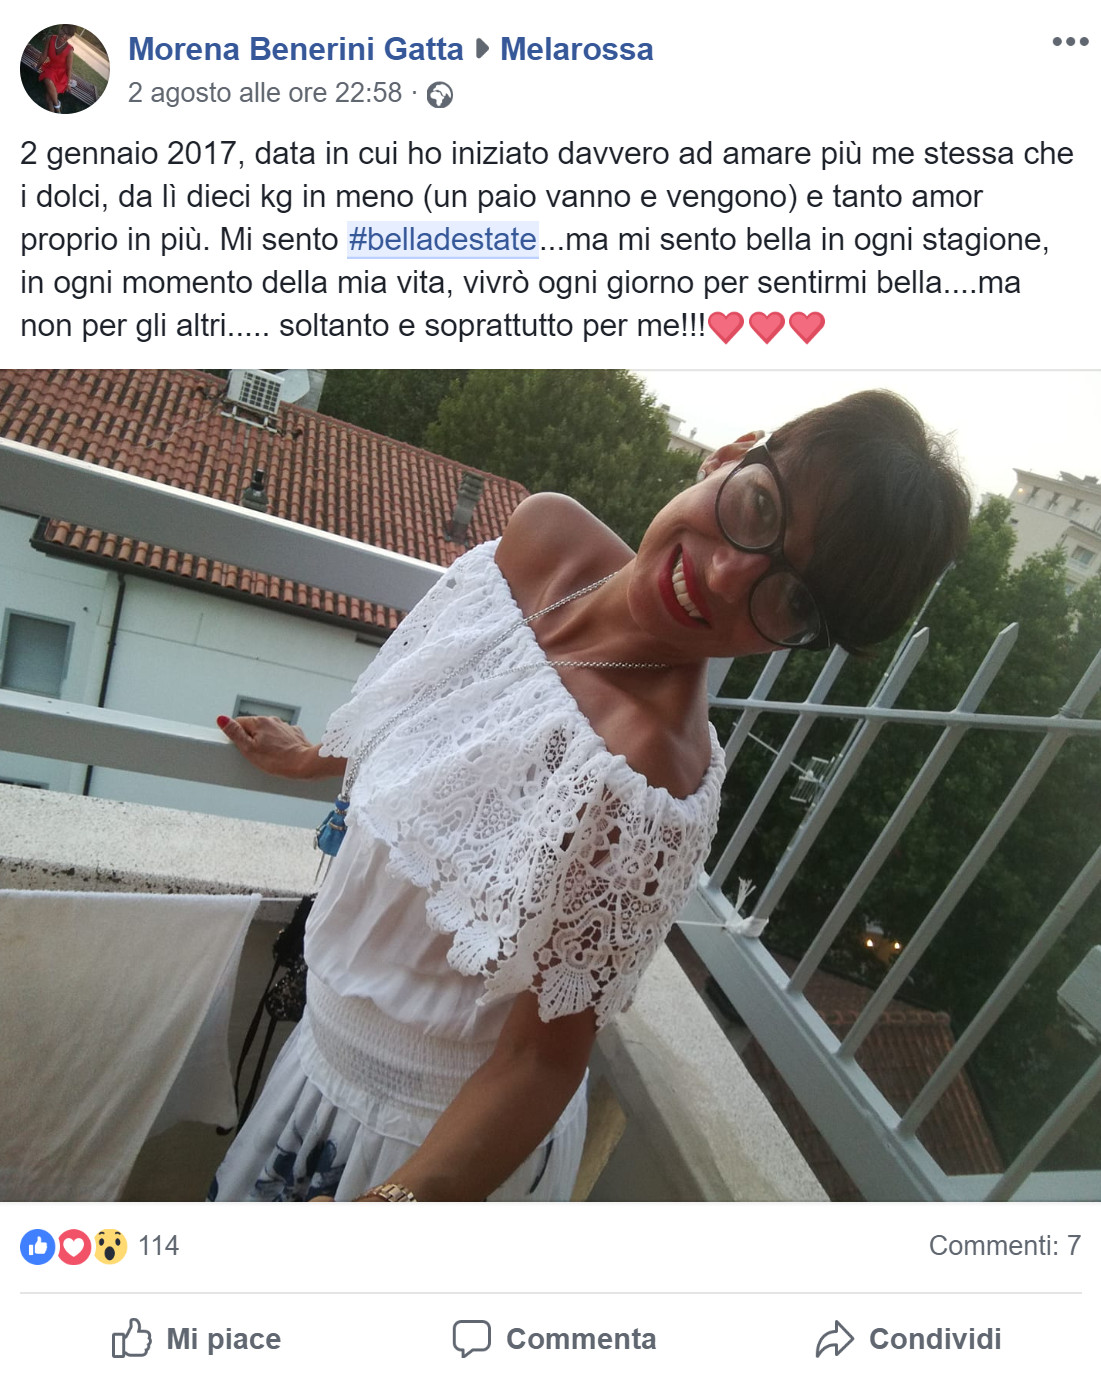 Morena Benerini Gatta #belladestate